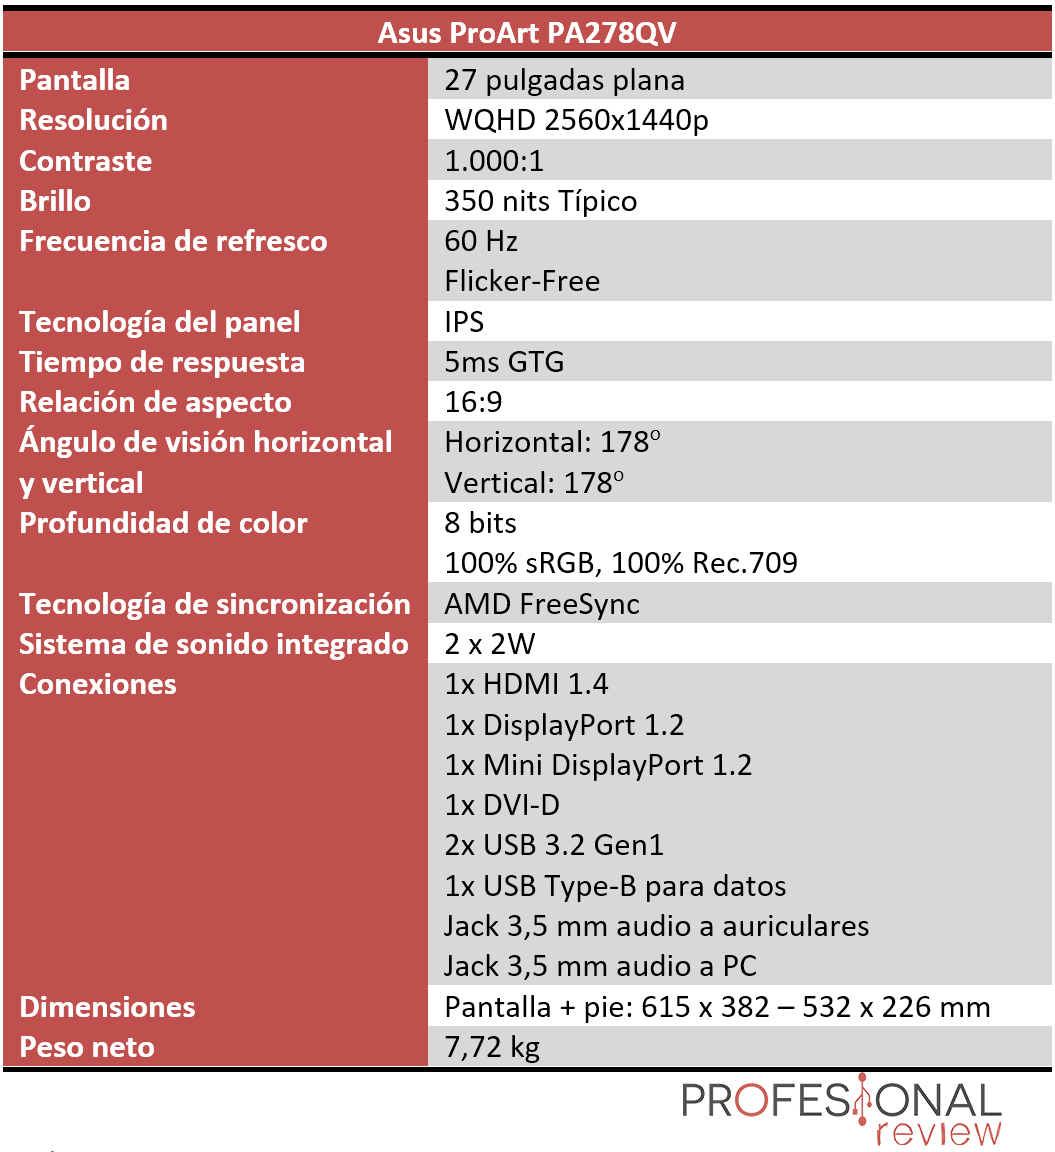 Asus ProArt PA278QV Características